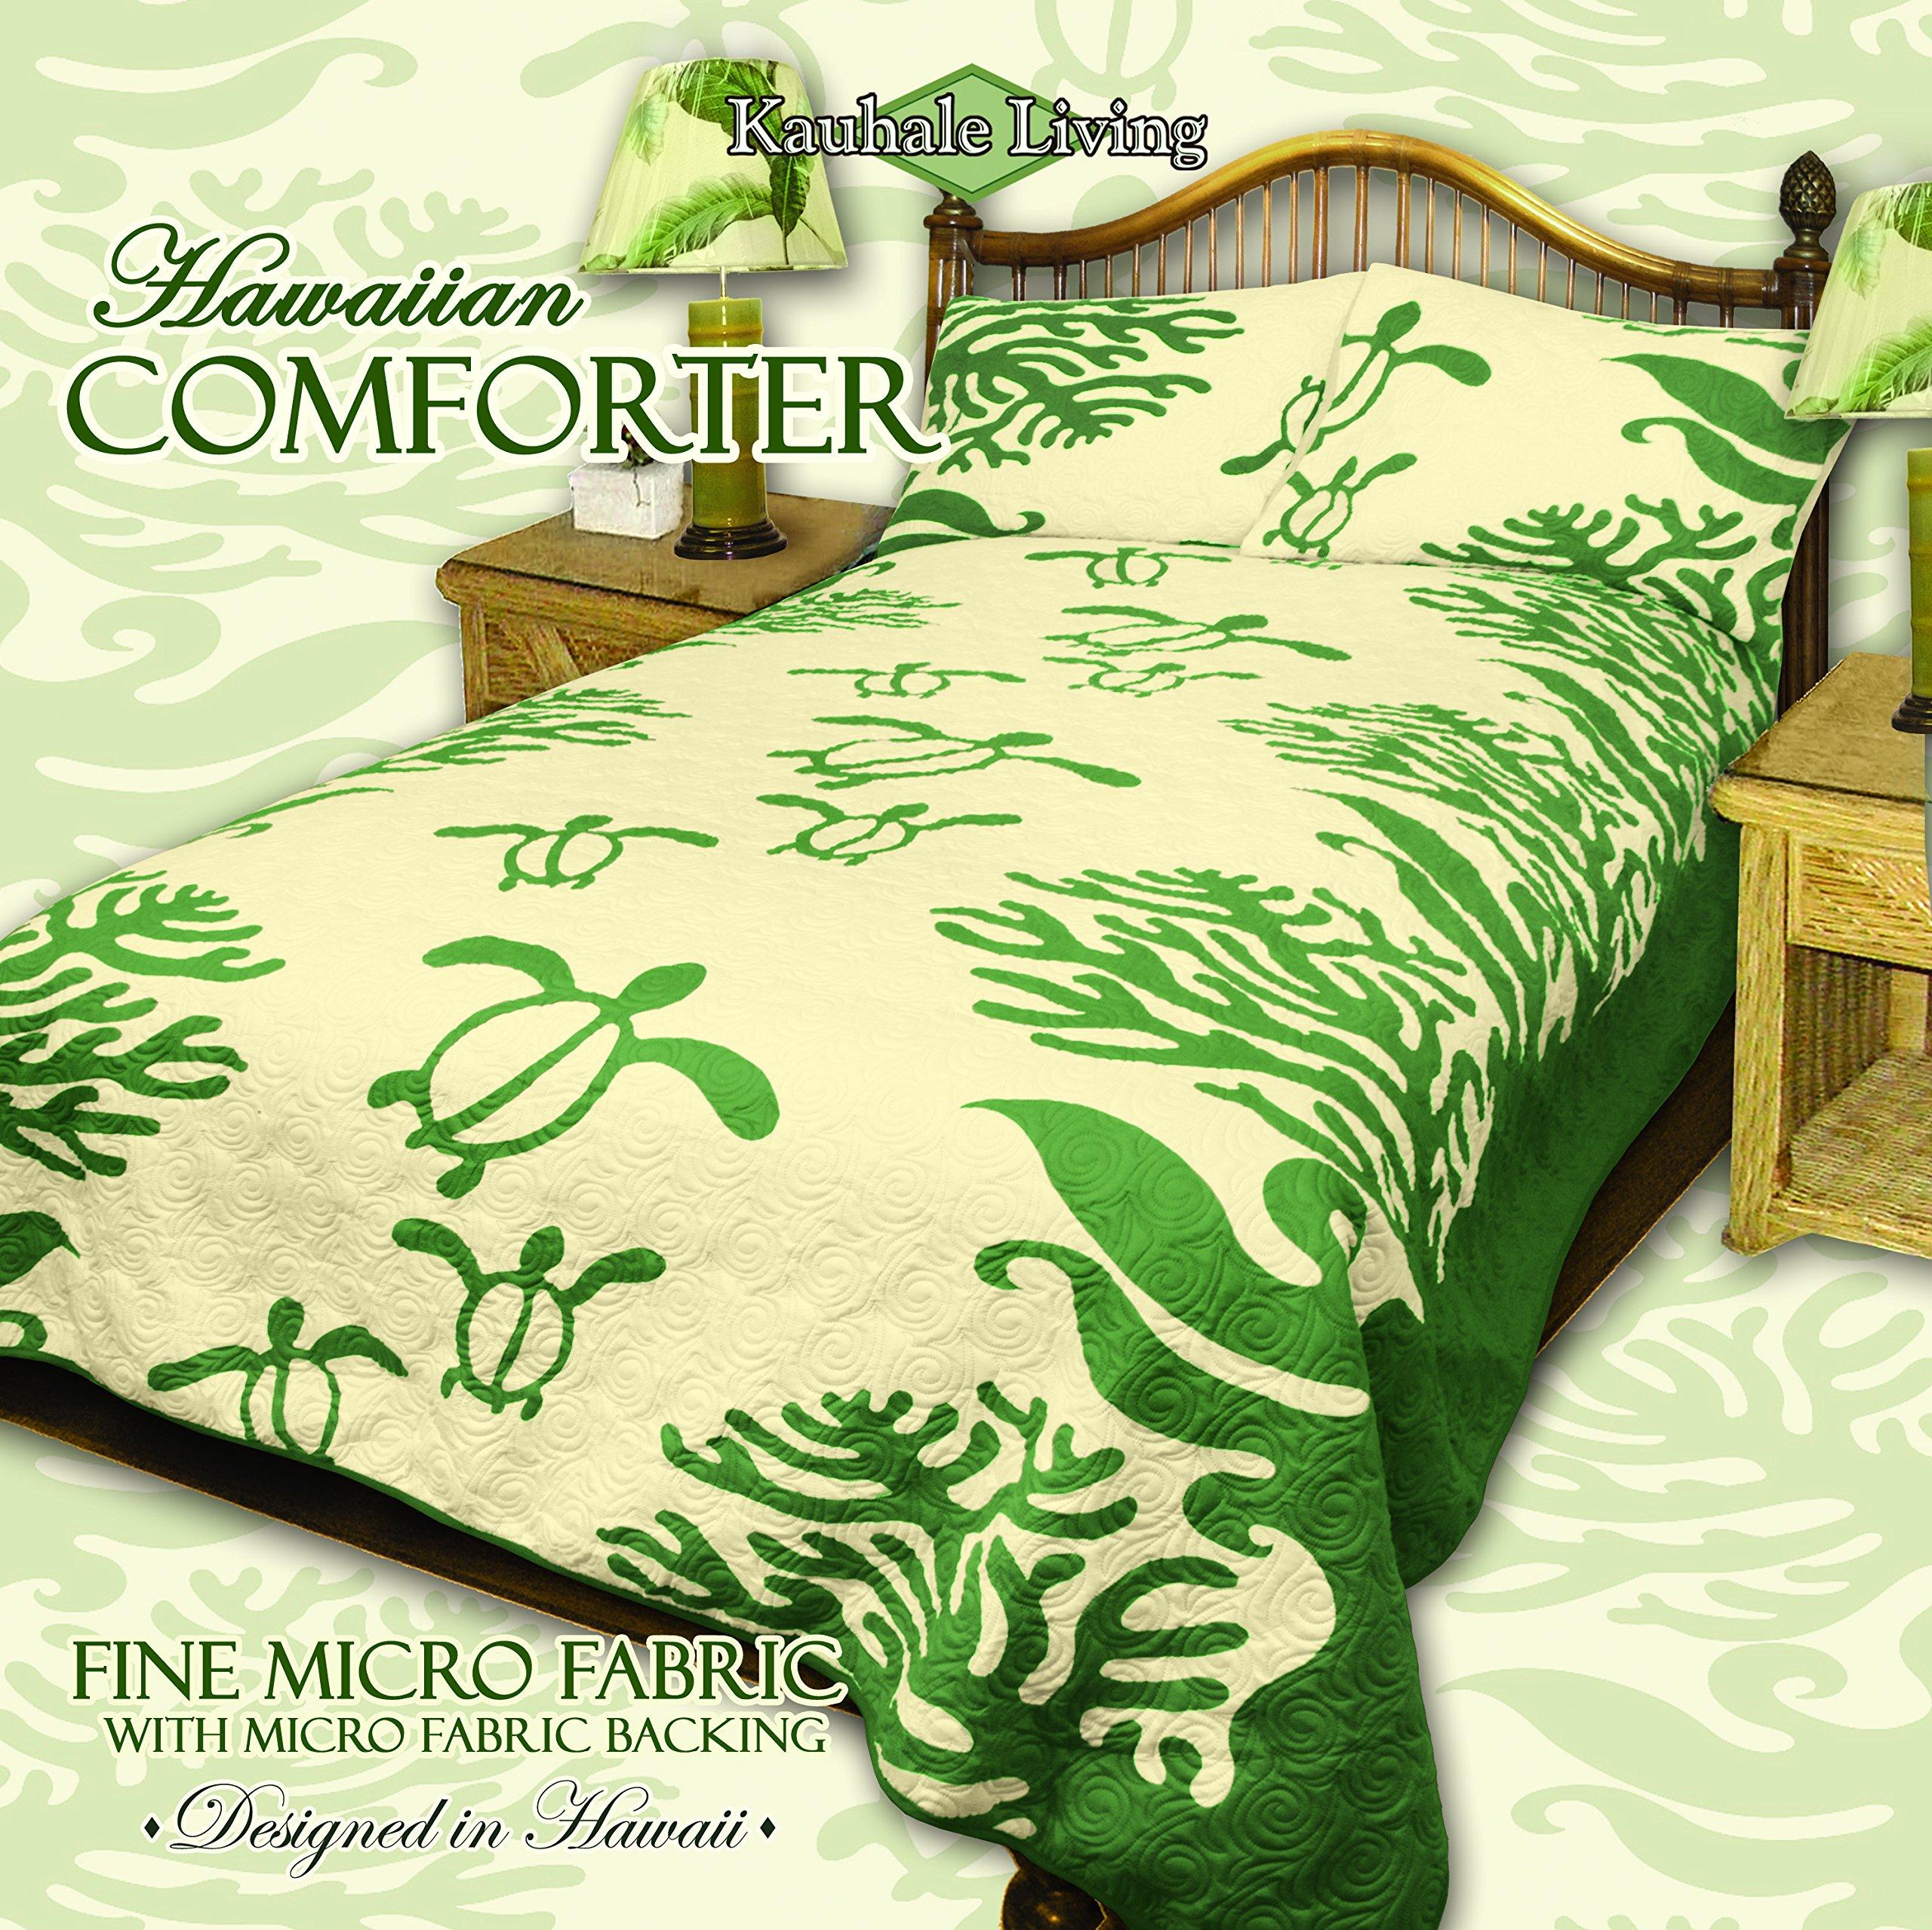 King Hawaiian Quilt bedding Comforter with two pillow shams (Honu Sea Turtle) (Sage Green)